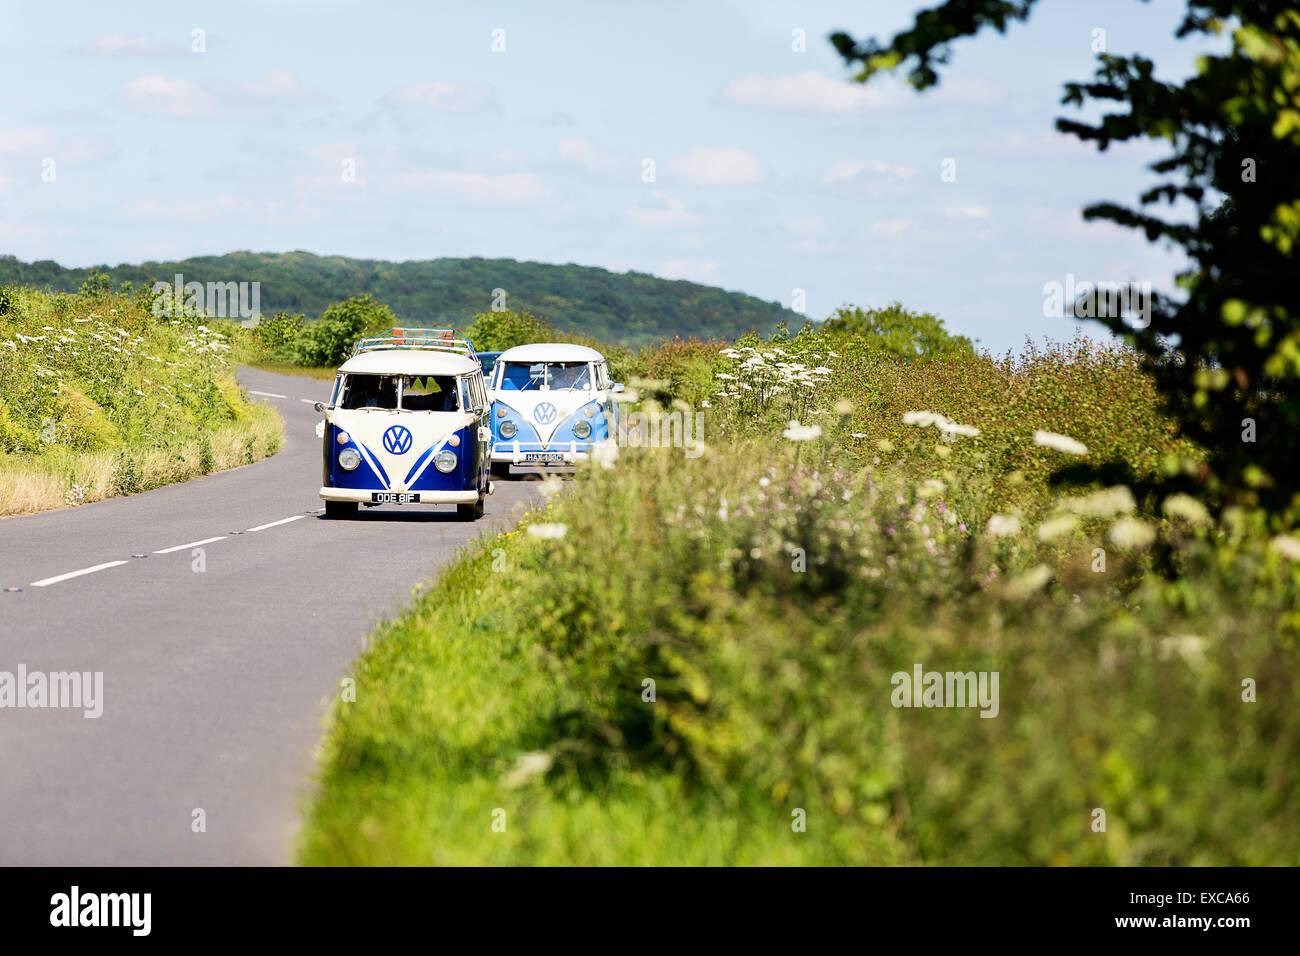 two-old-classic-1960s-vw-camper-vans-dri